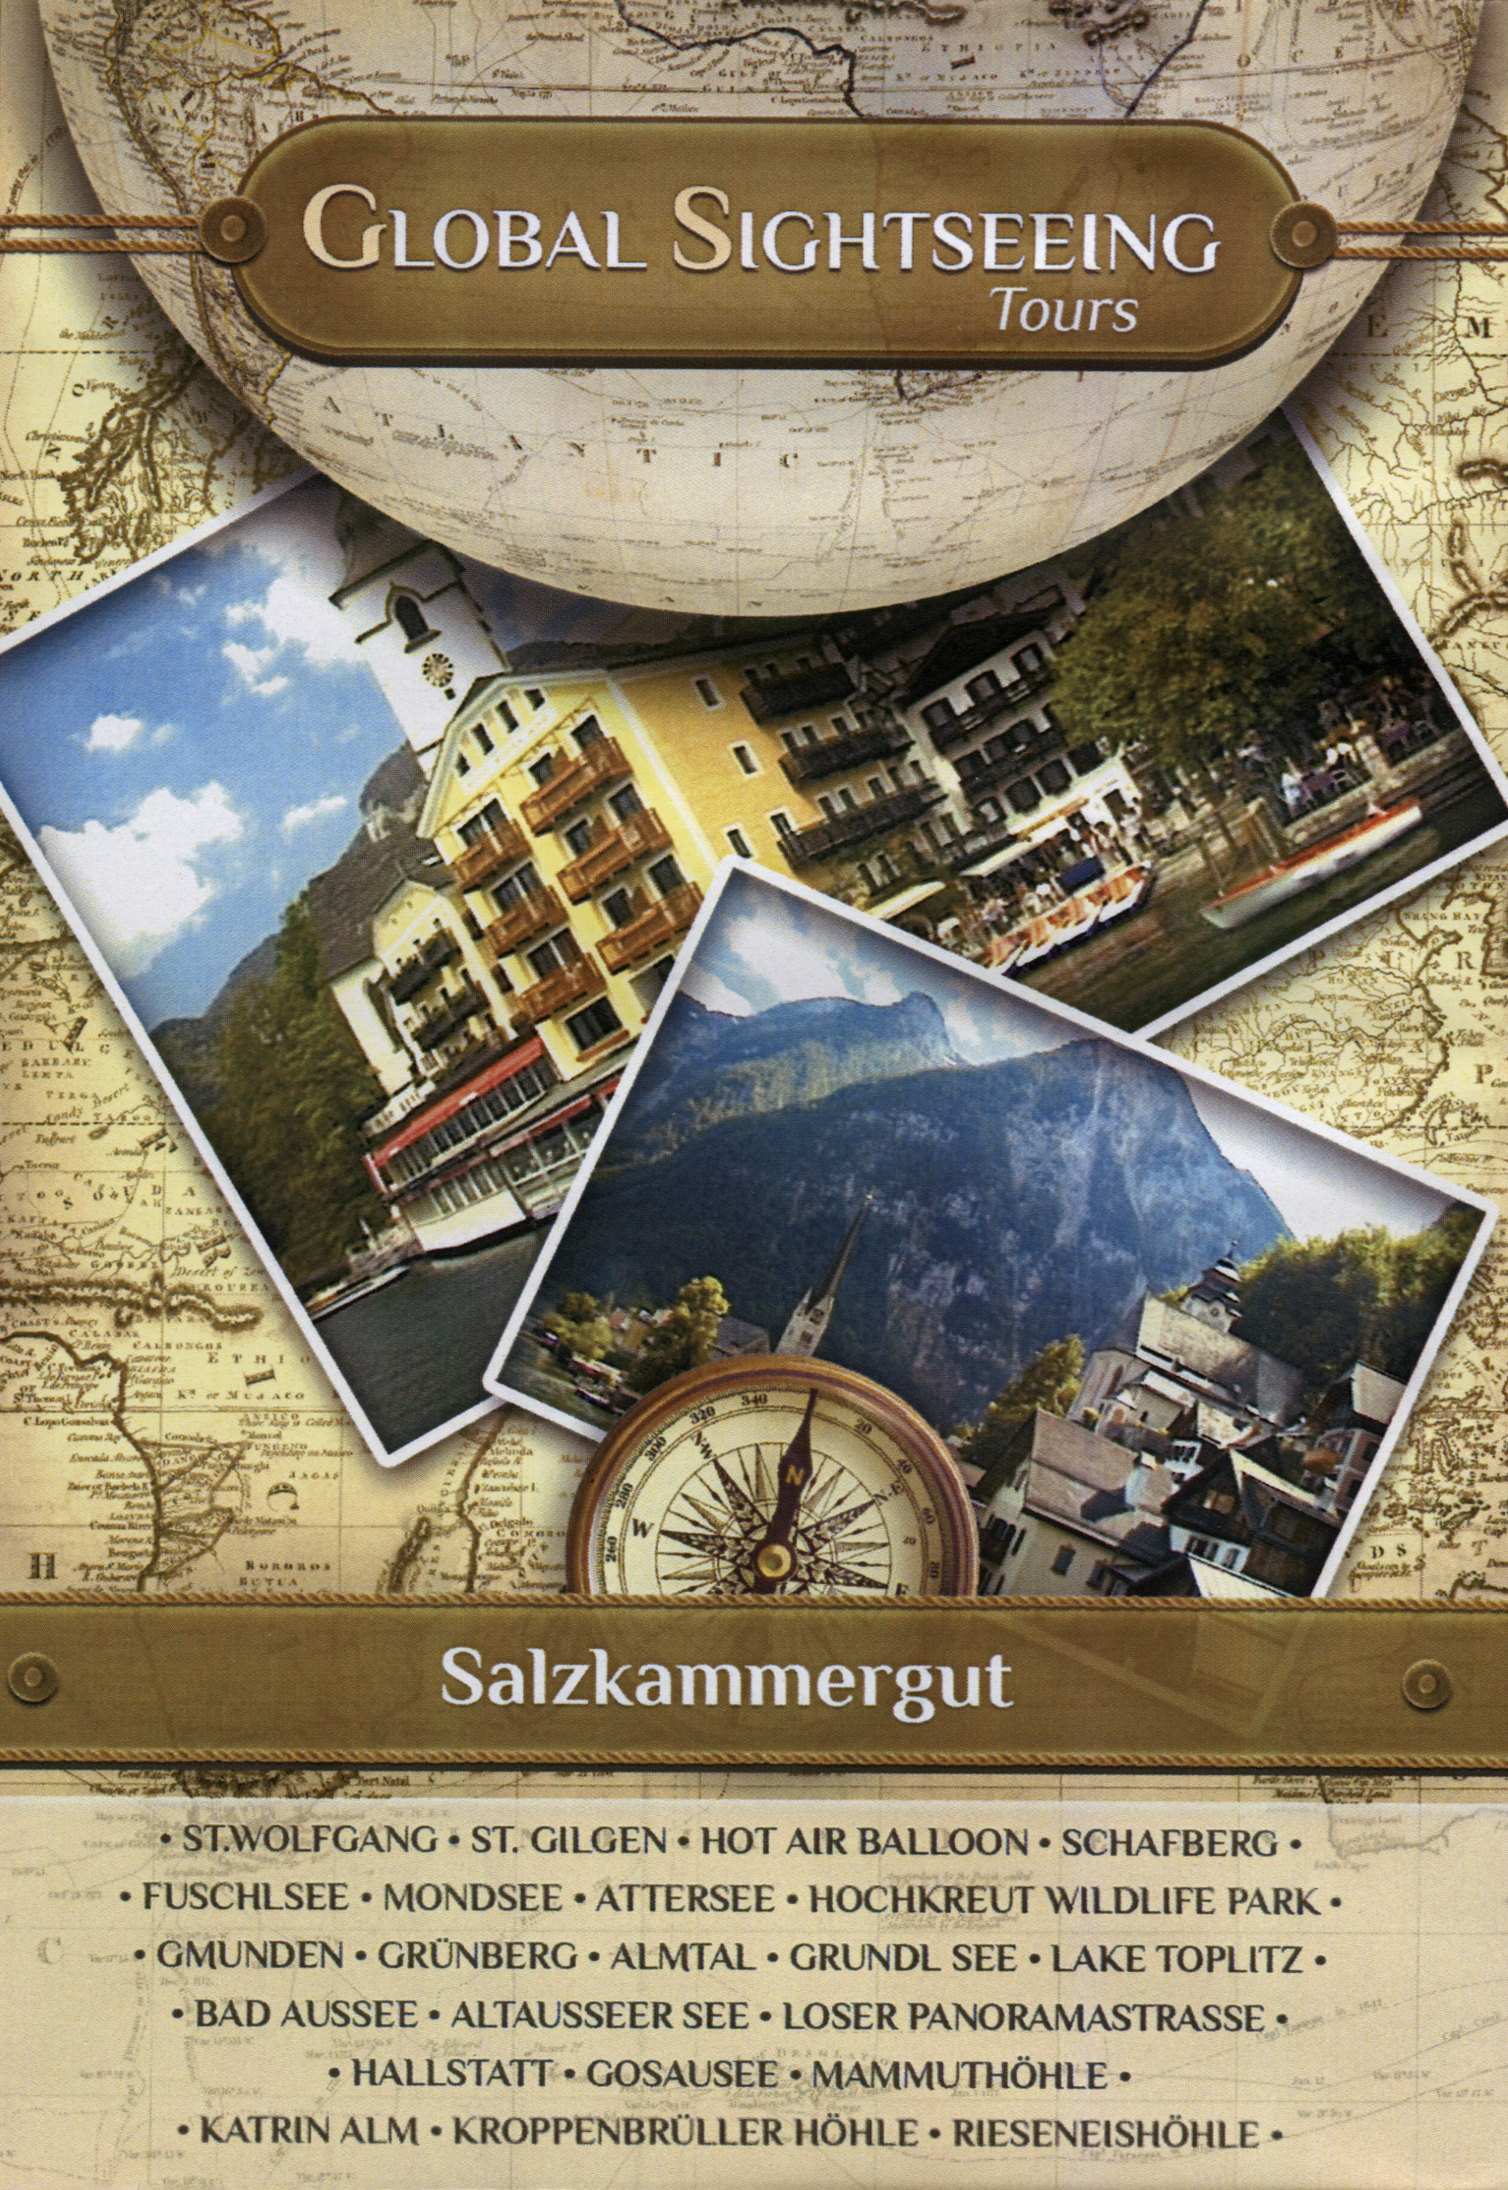 Global Sightseeing Tours: Salzkammergut